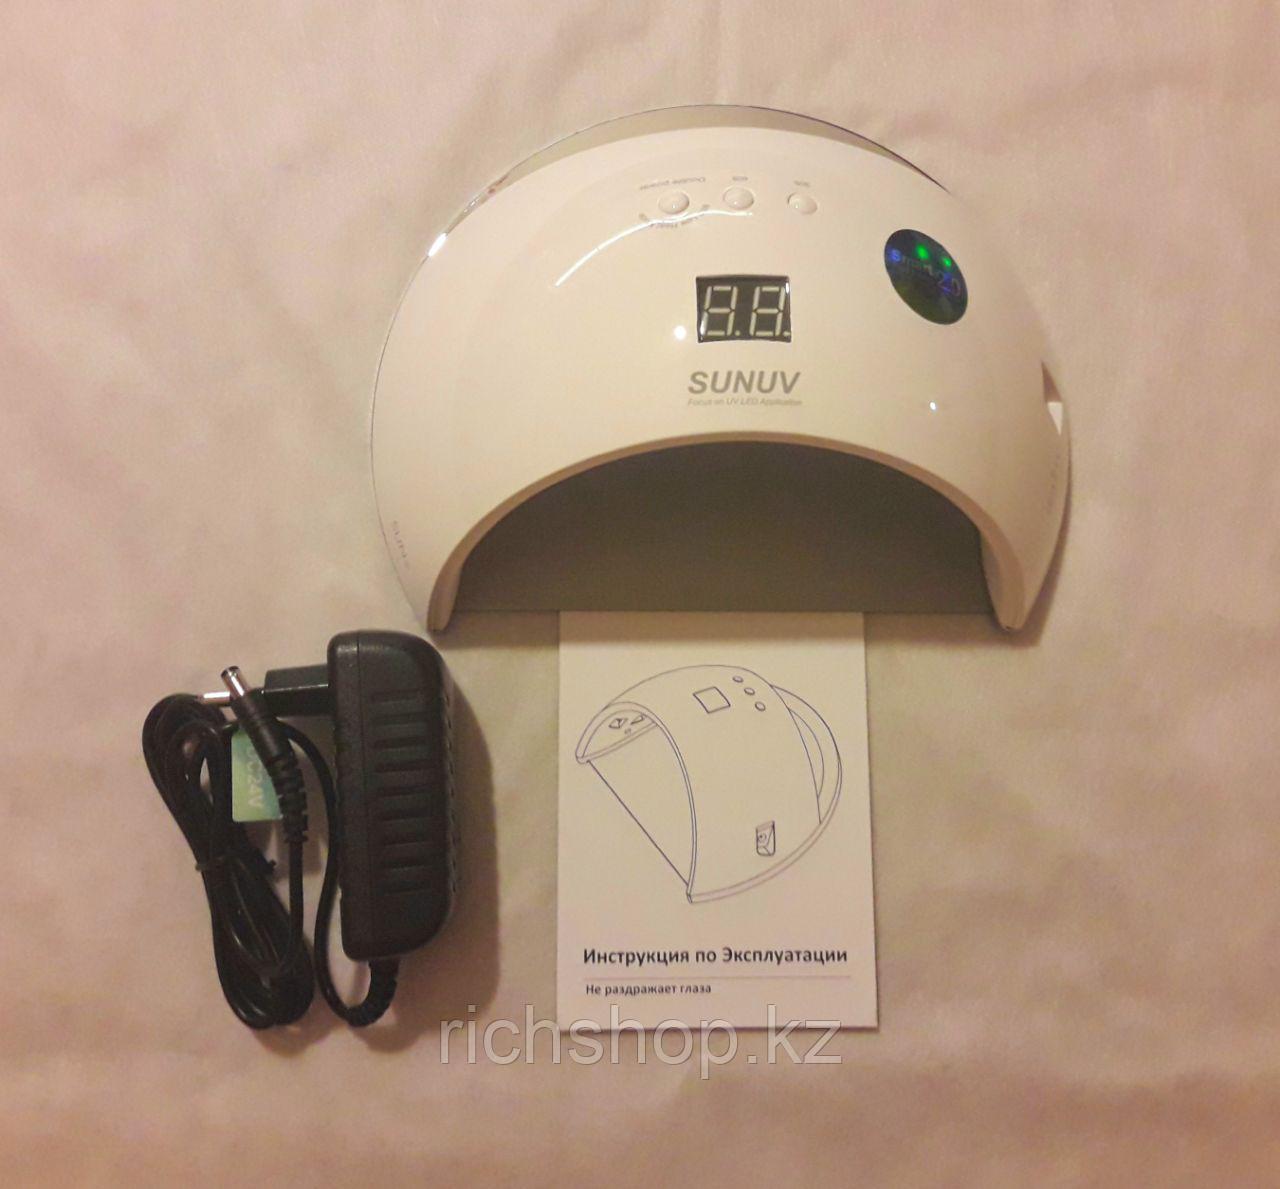 SUNUV SUN 6 - Focus On LED Application 48 W